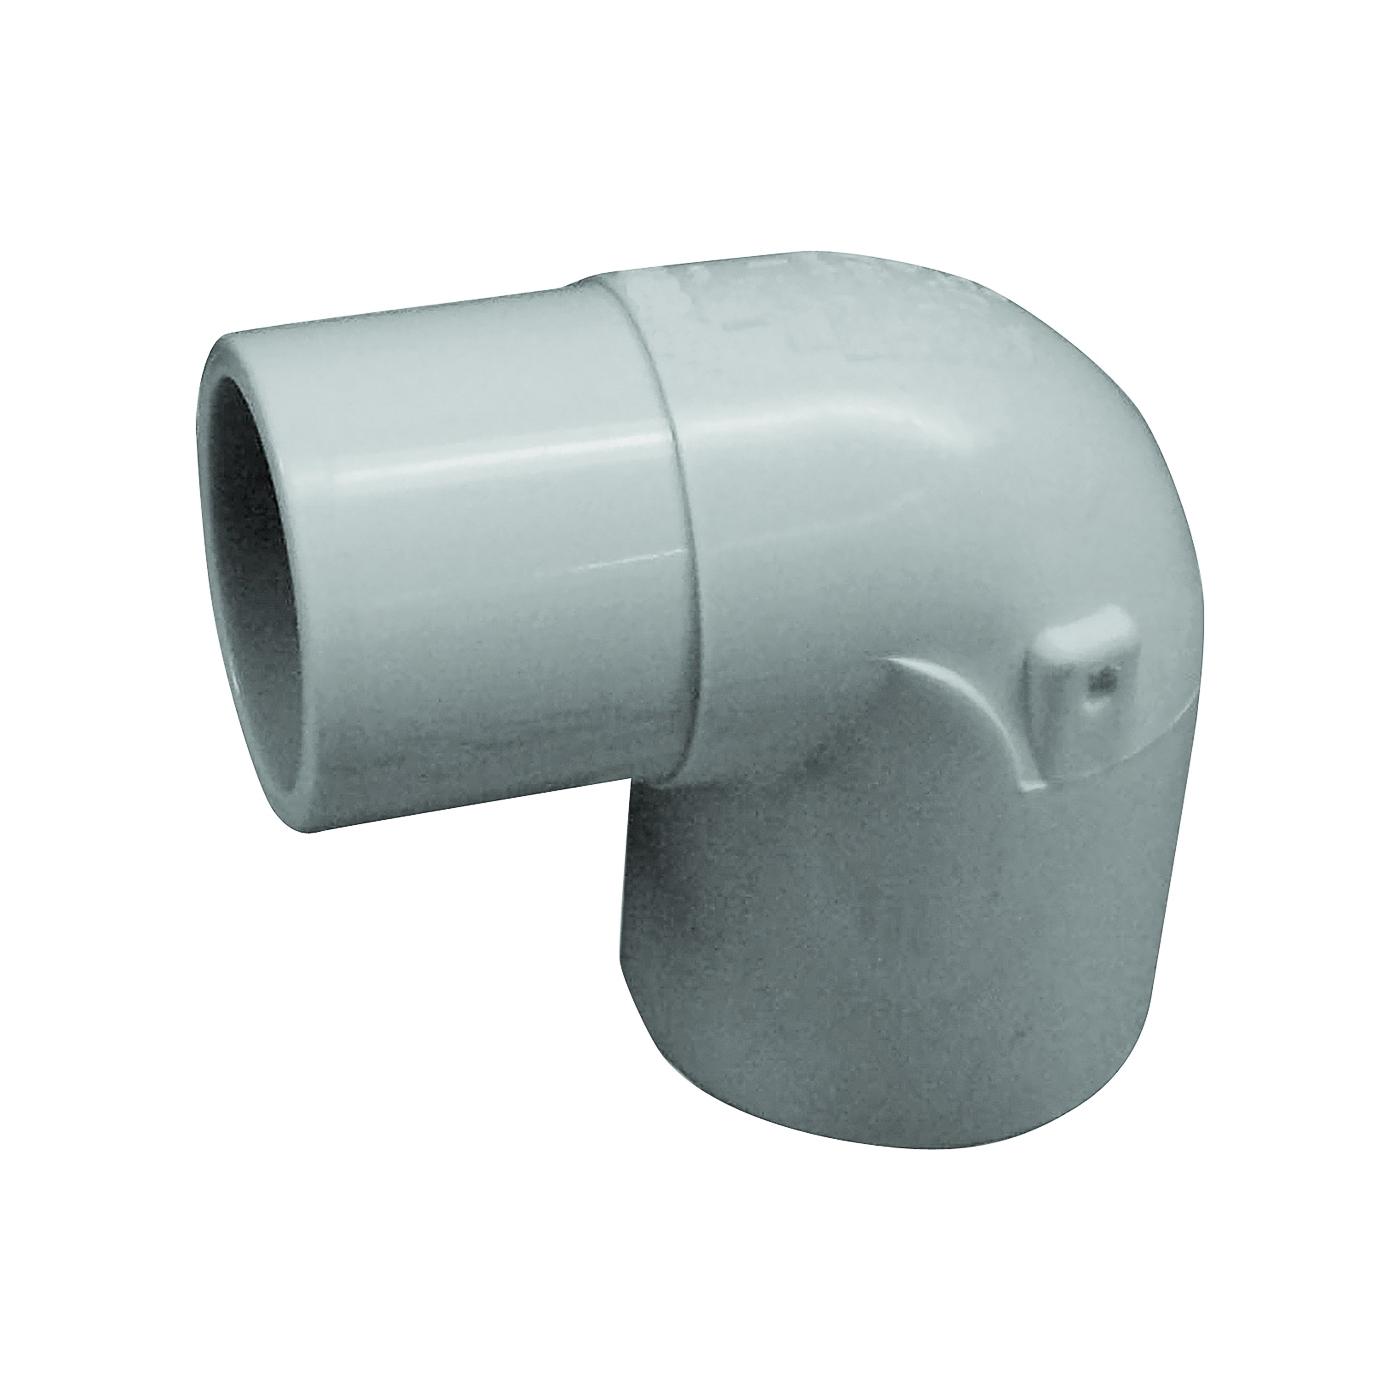 Picture of GENOVA 300 32905 Street Pipe Elbow, 1/2 in, Slip x Spigot, 90 deg Angle, PVC, White, SCH 40 Schedule